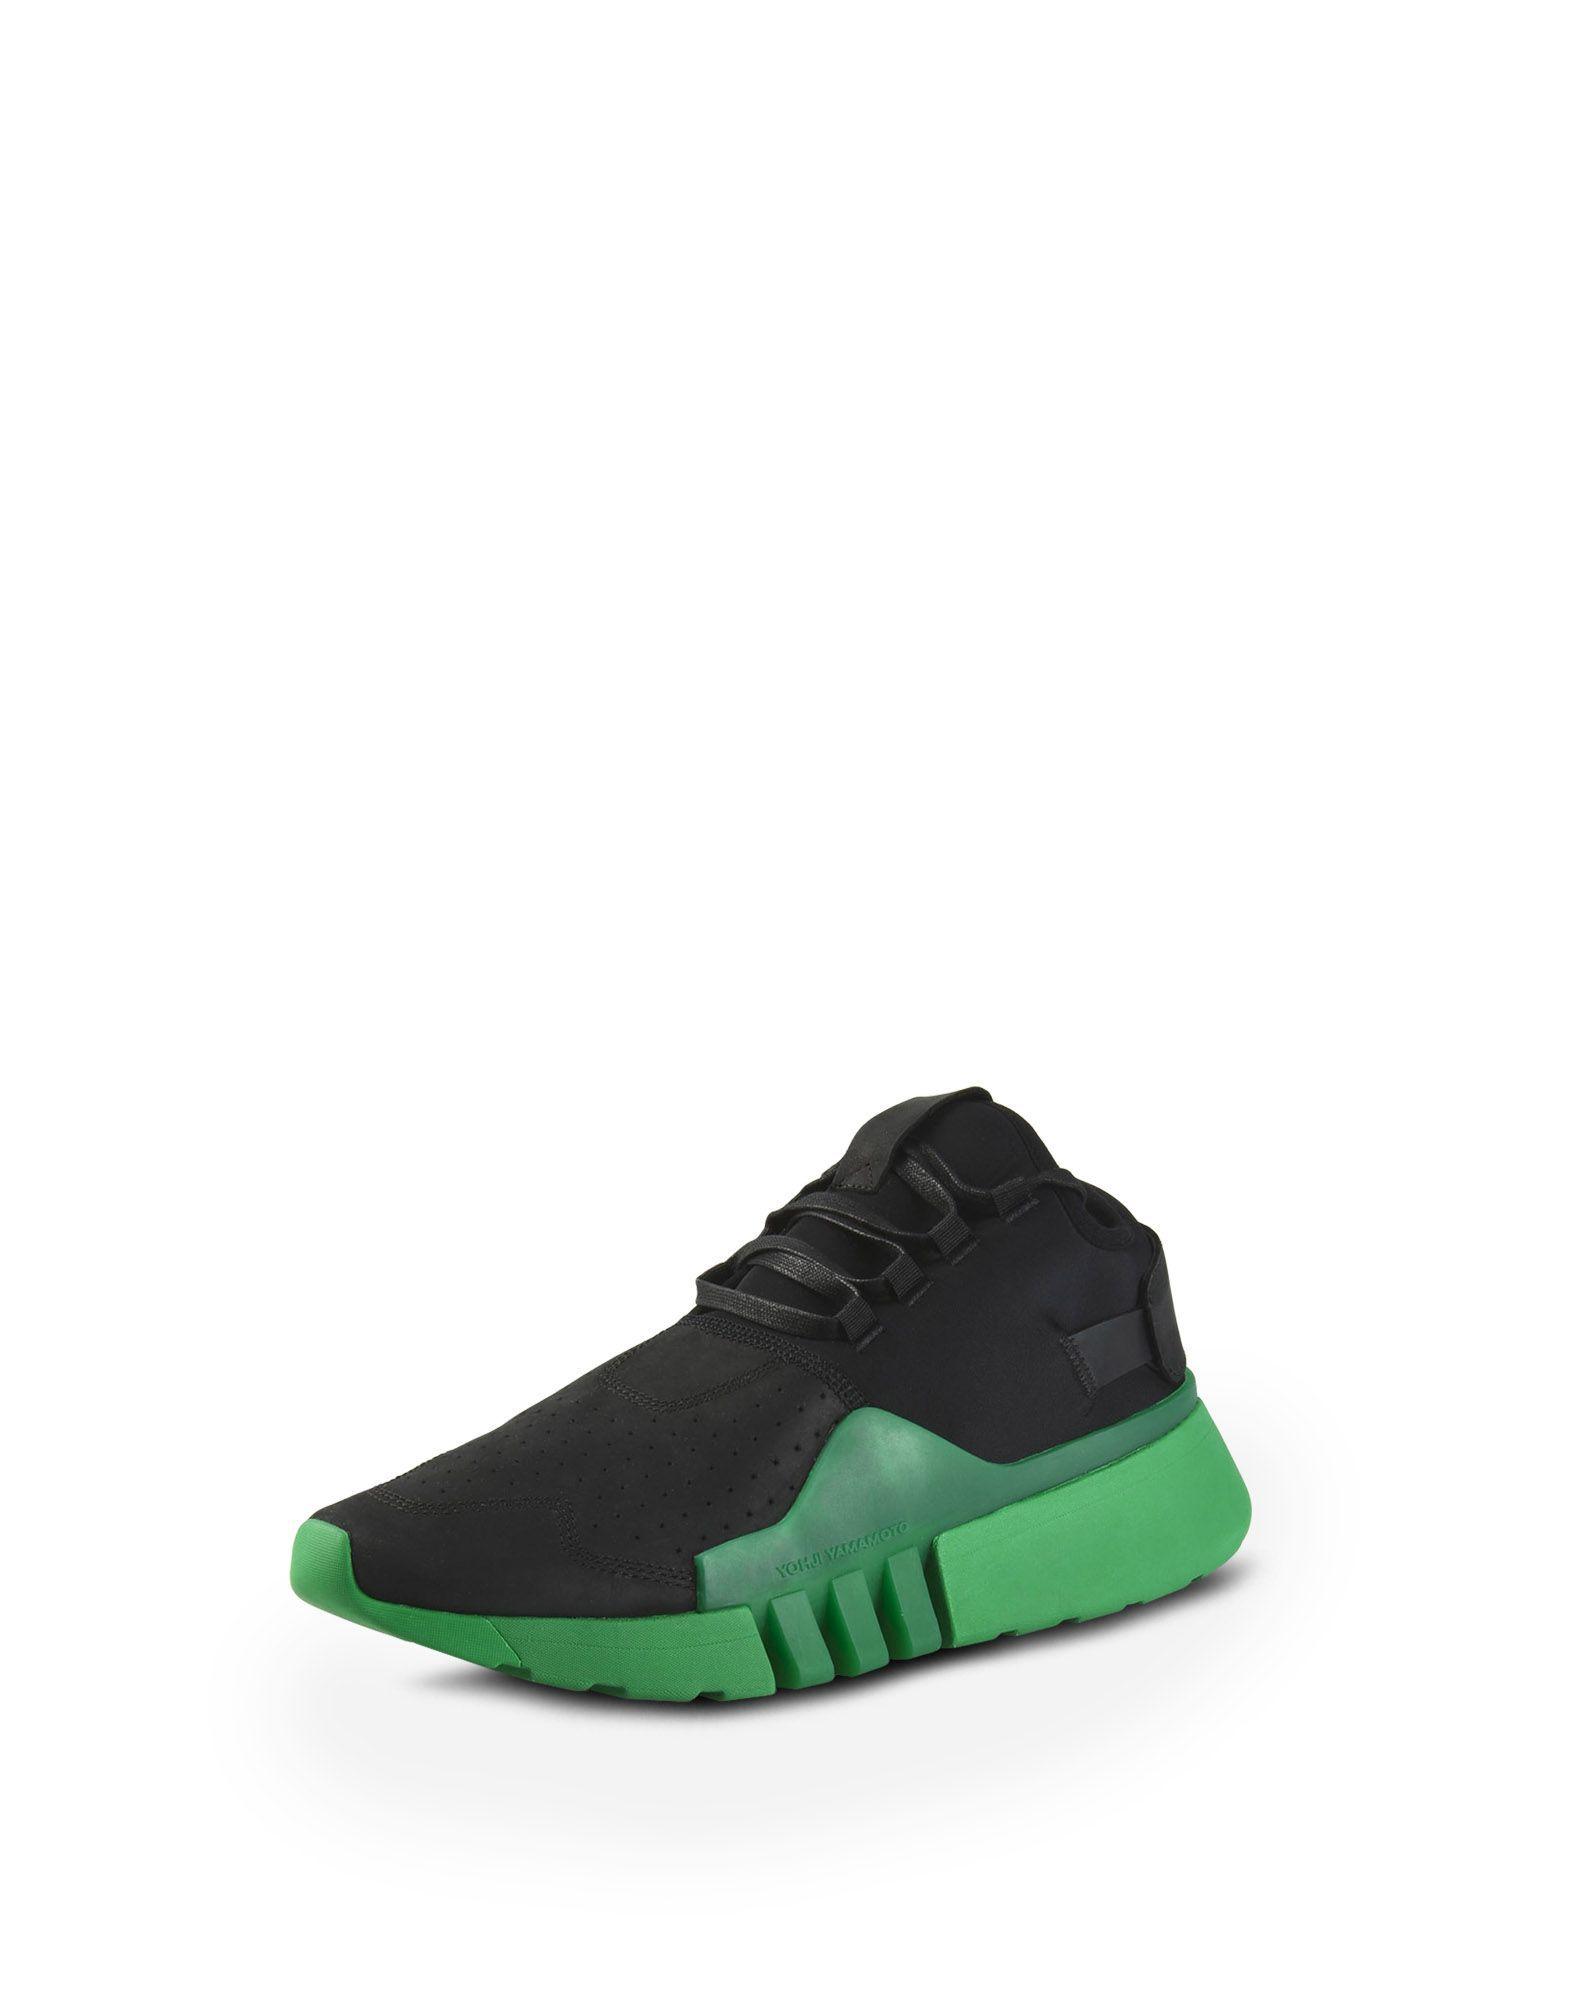 adidas donna sneakers estive